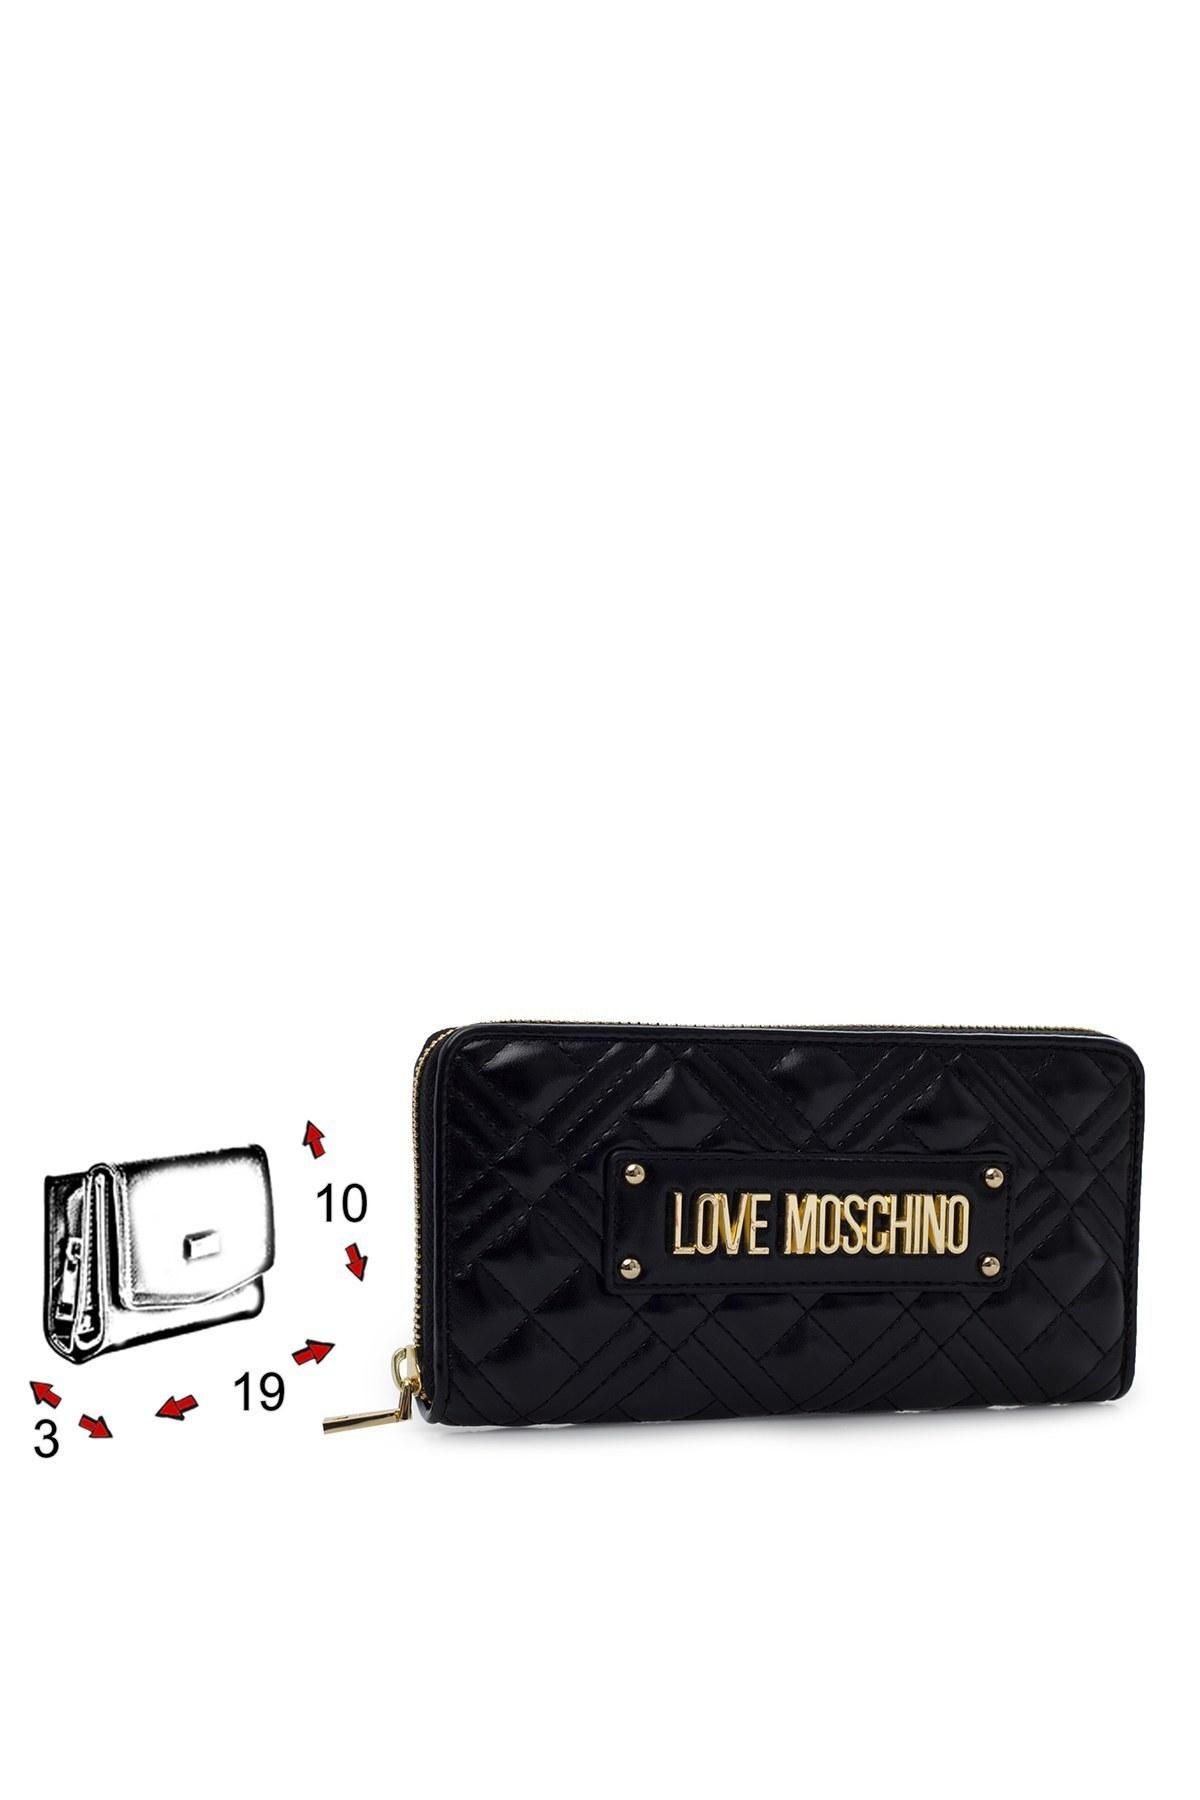 Love Moschino Logo Baskılı Fermuarlı Kadın Cüzdan JC5600PP1BLA0000 SİYAH